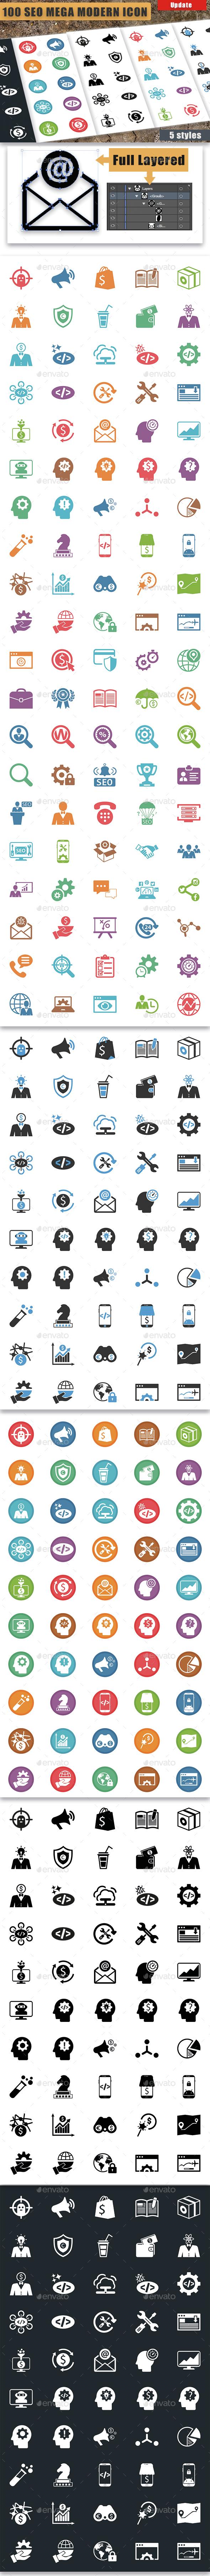 100 Seo Mega Modern Icons v2.0 - Business Icons